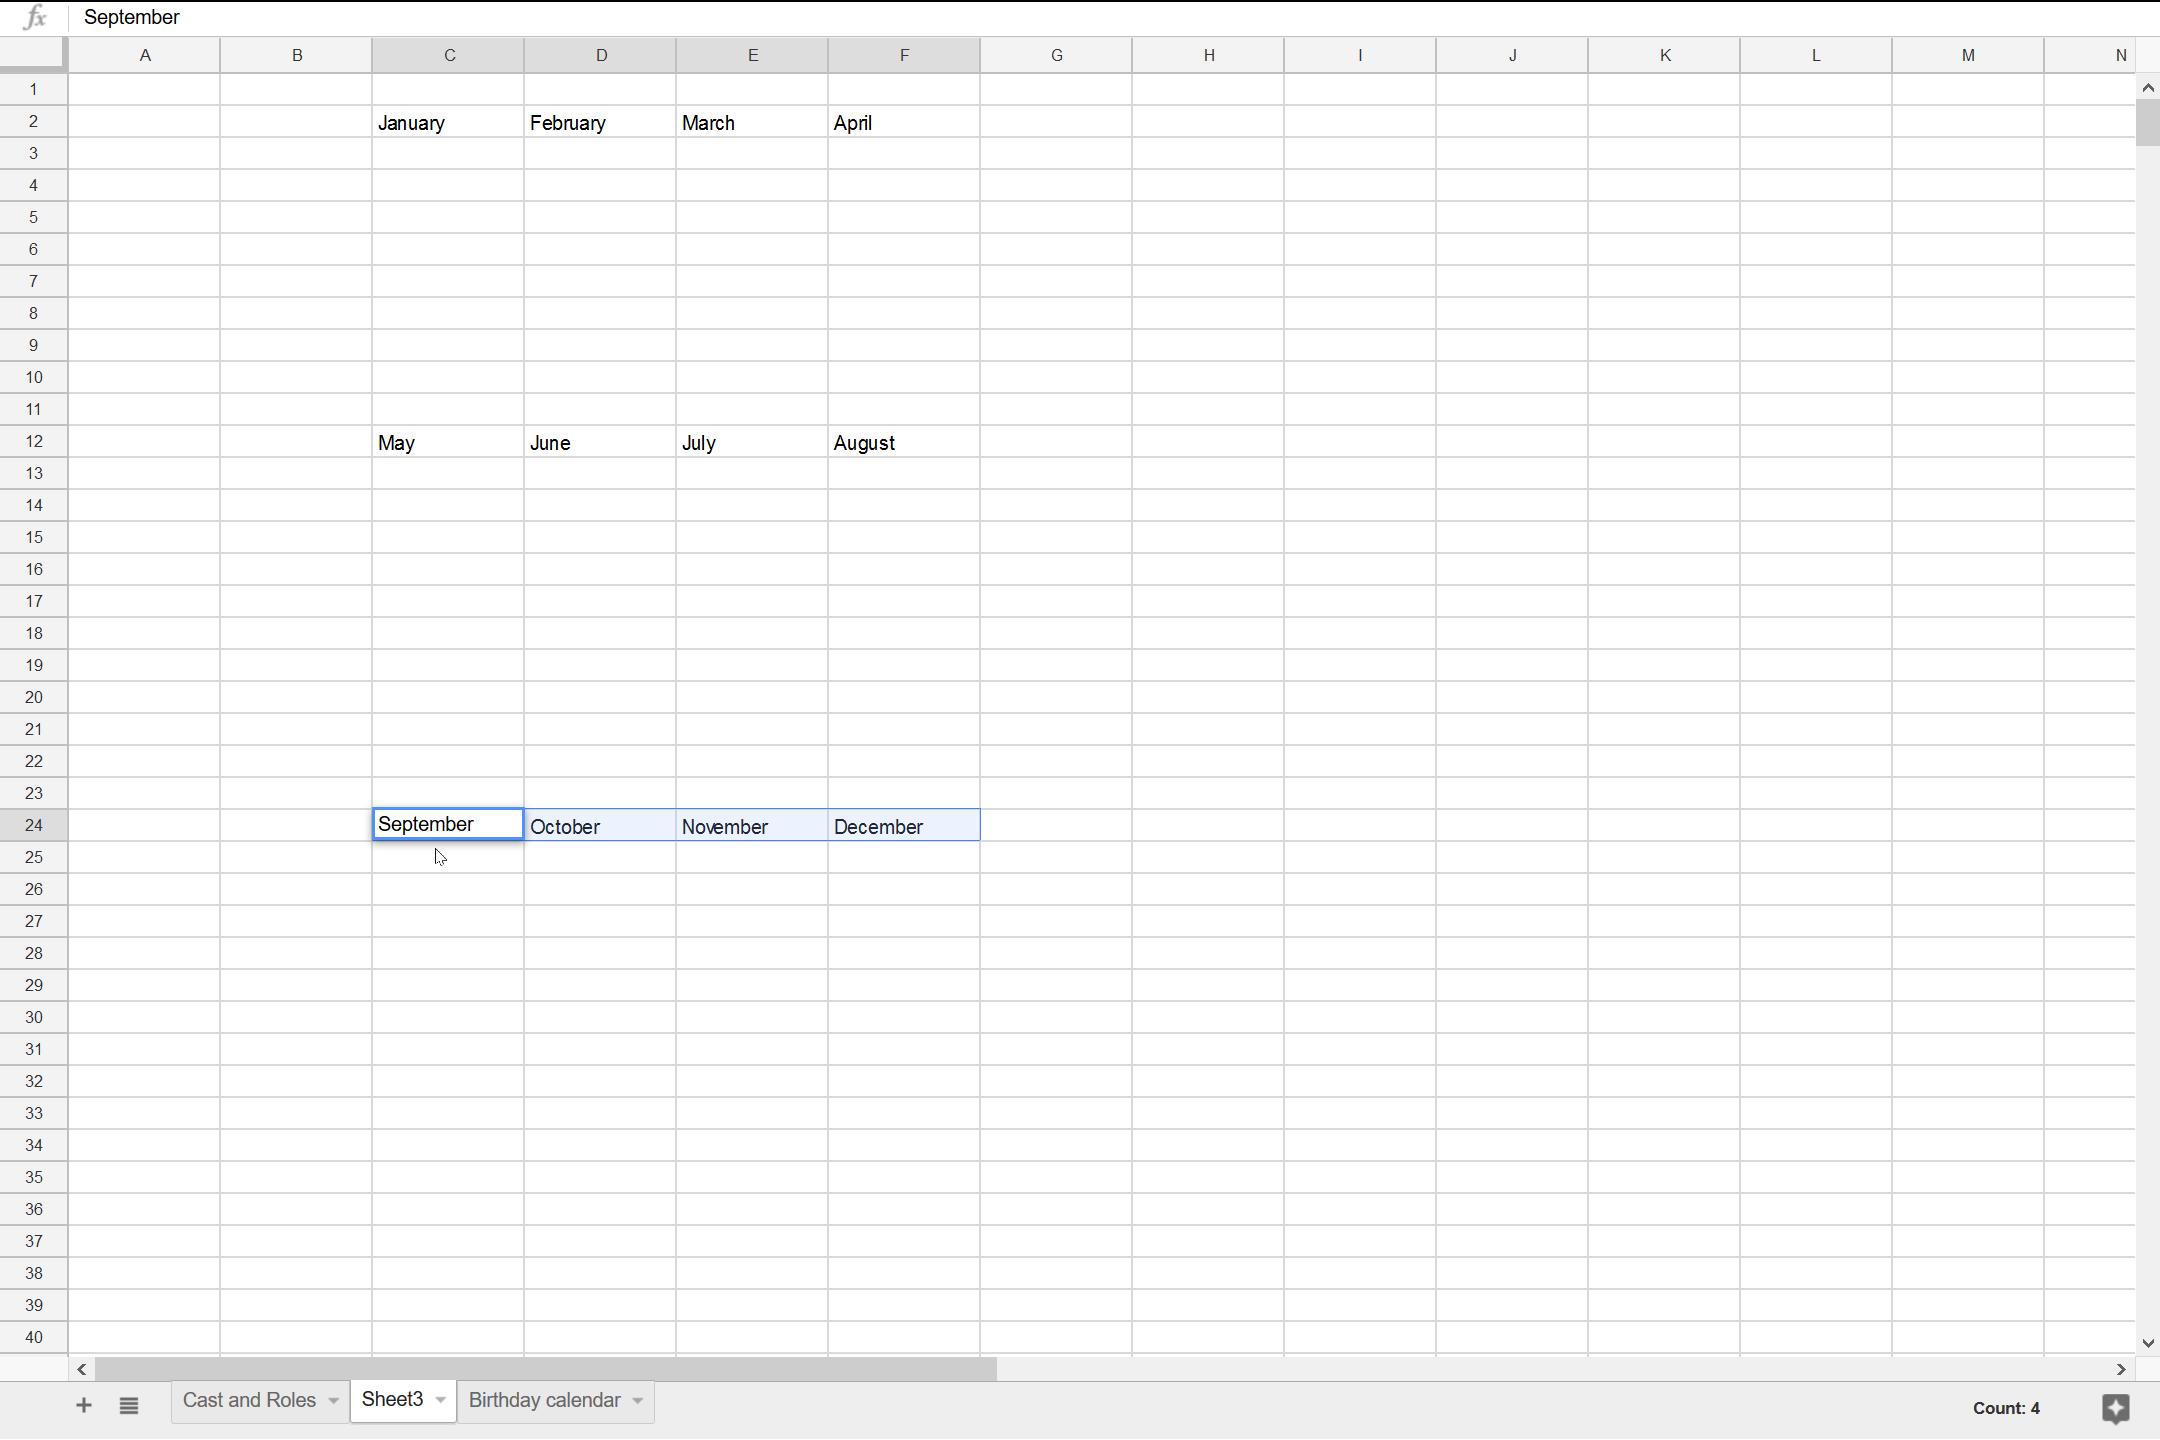 Building the Calendar - 03